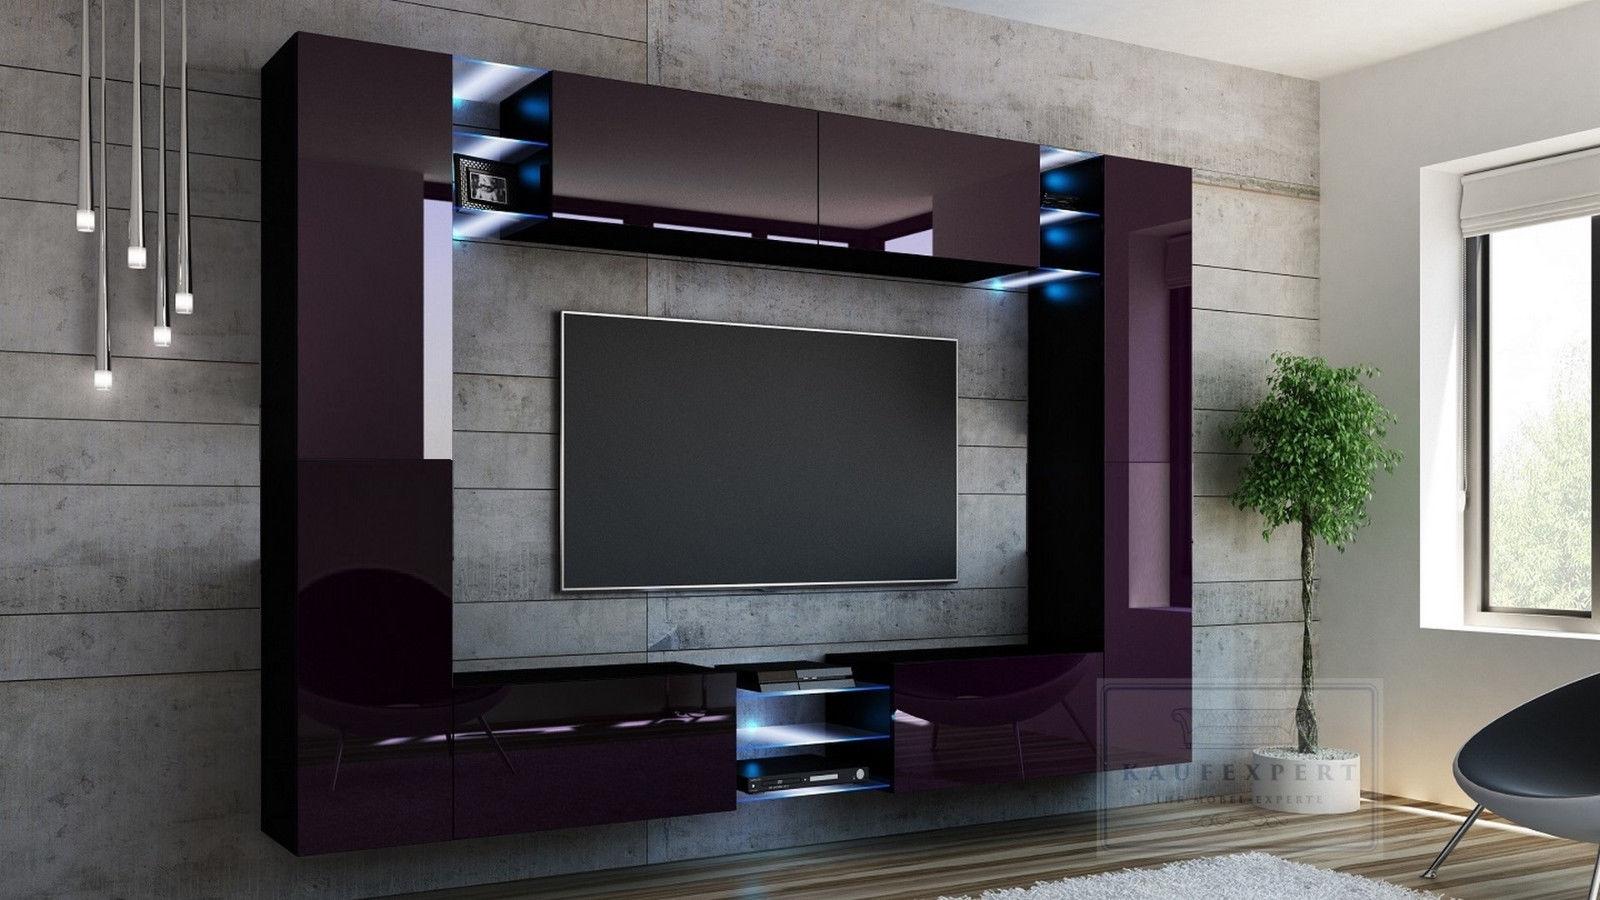 kaufexpert wohnwand kino aubergine hochglanz schwarz mediawand medienwand design modern led